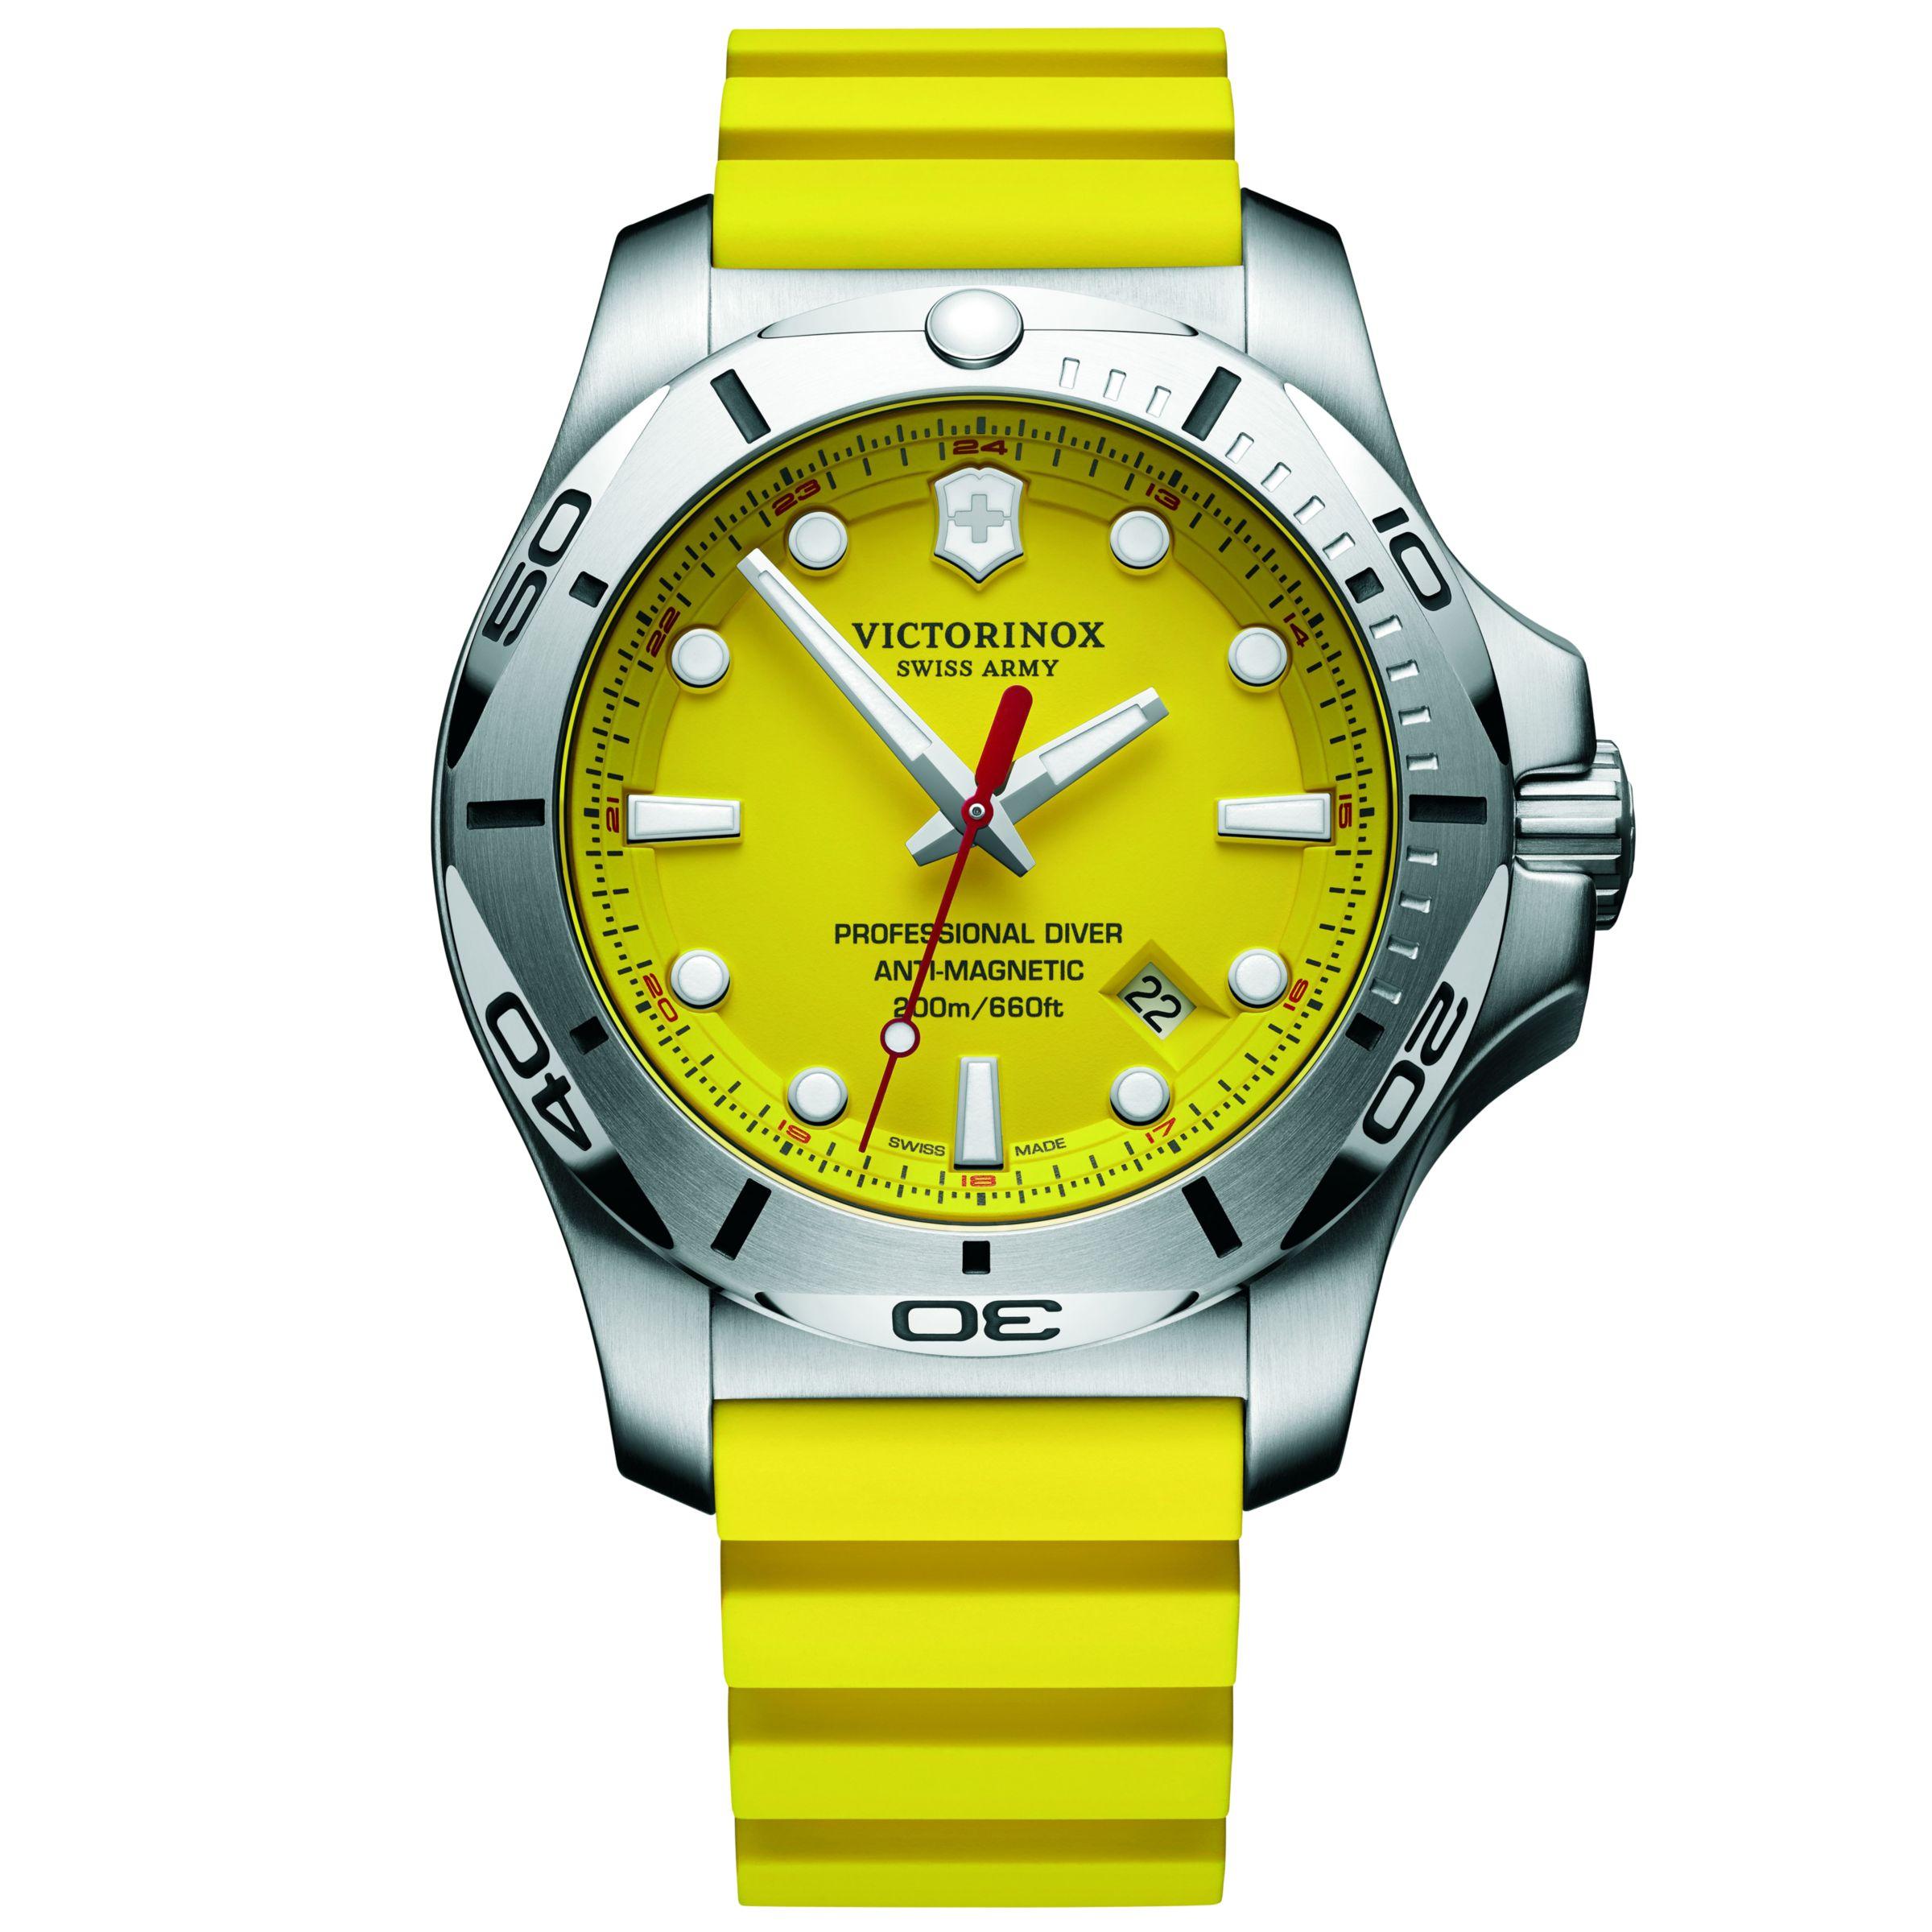 Victorinox Victorinox 241735 Men's I.N.O.X Diver Rubber Strap Watch, Yellow